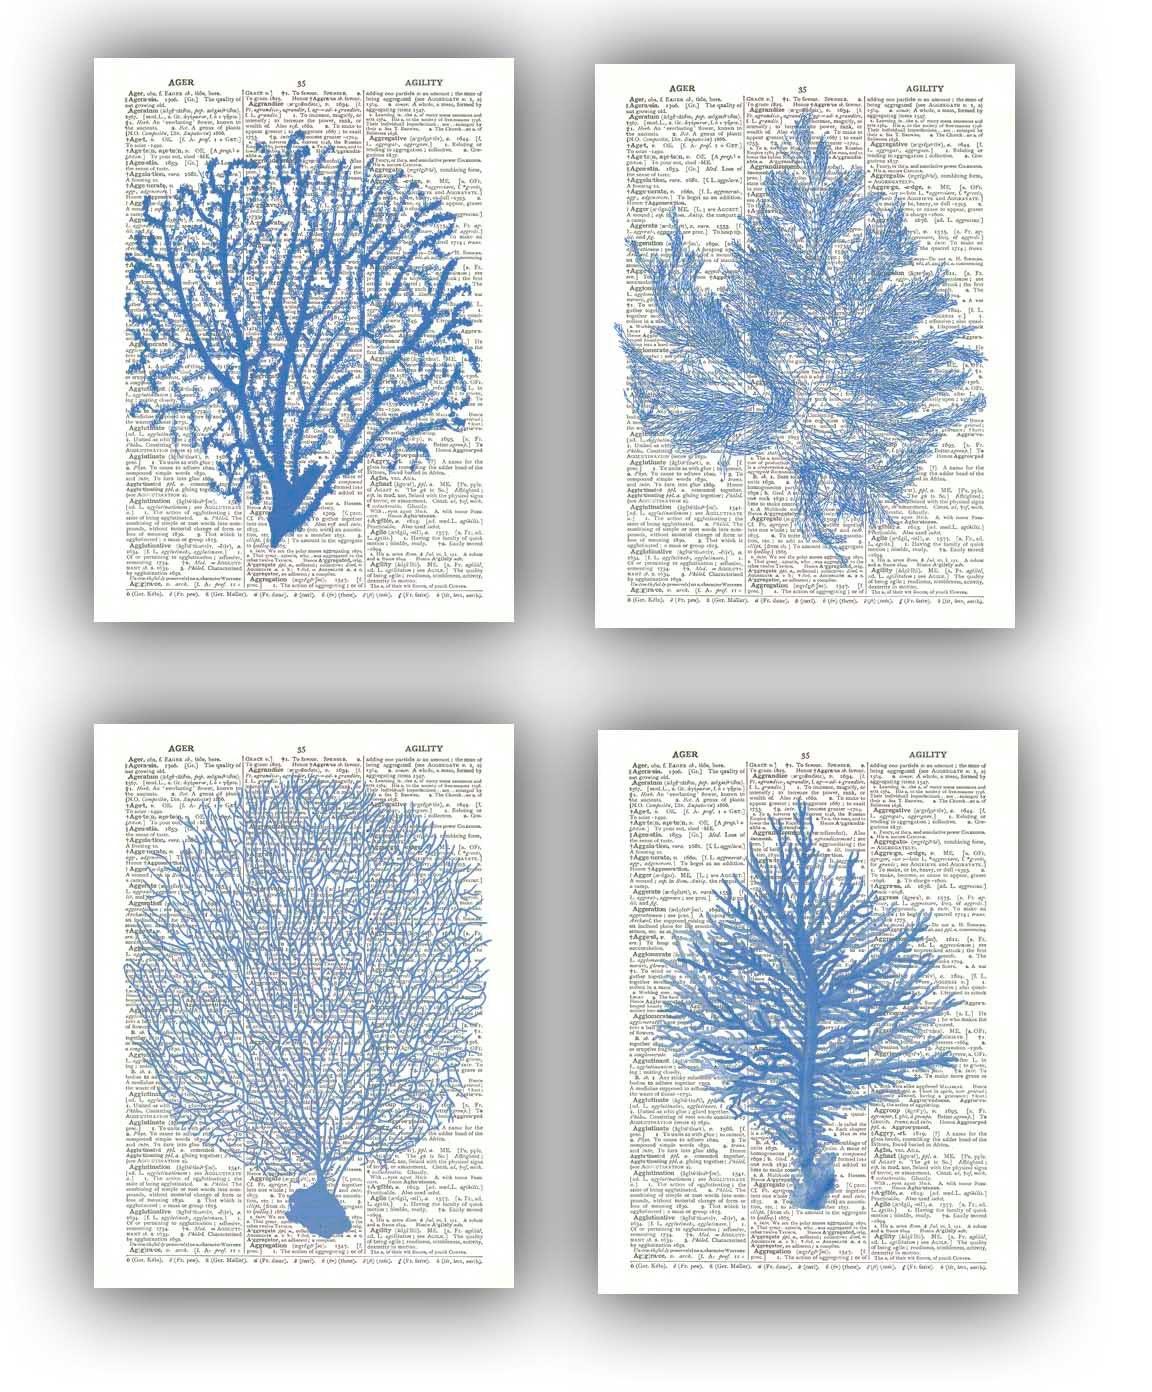 Cottage Bathroom Wall Decor : Seafan ocean blue prints sea fan grass coral by